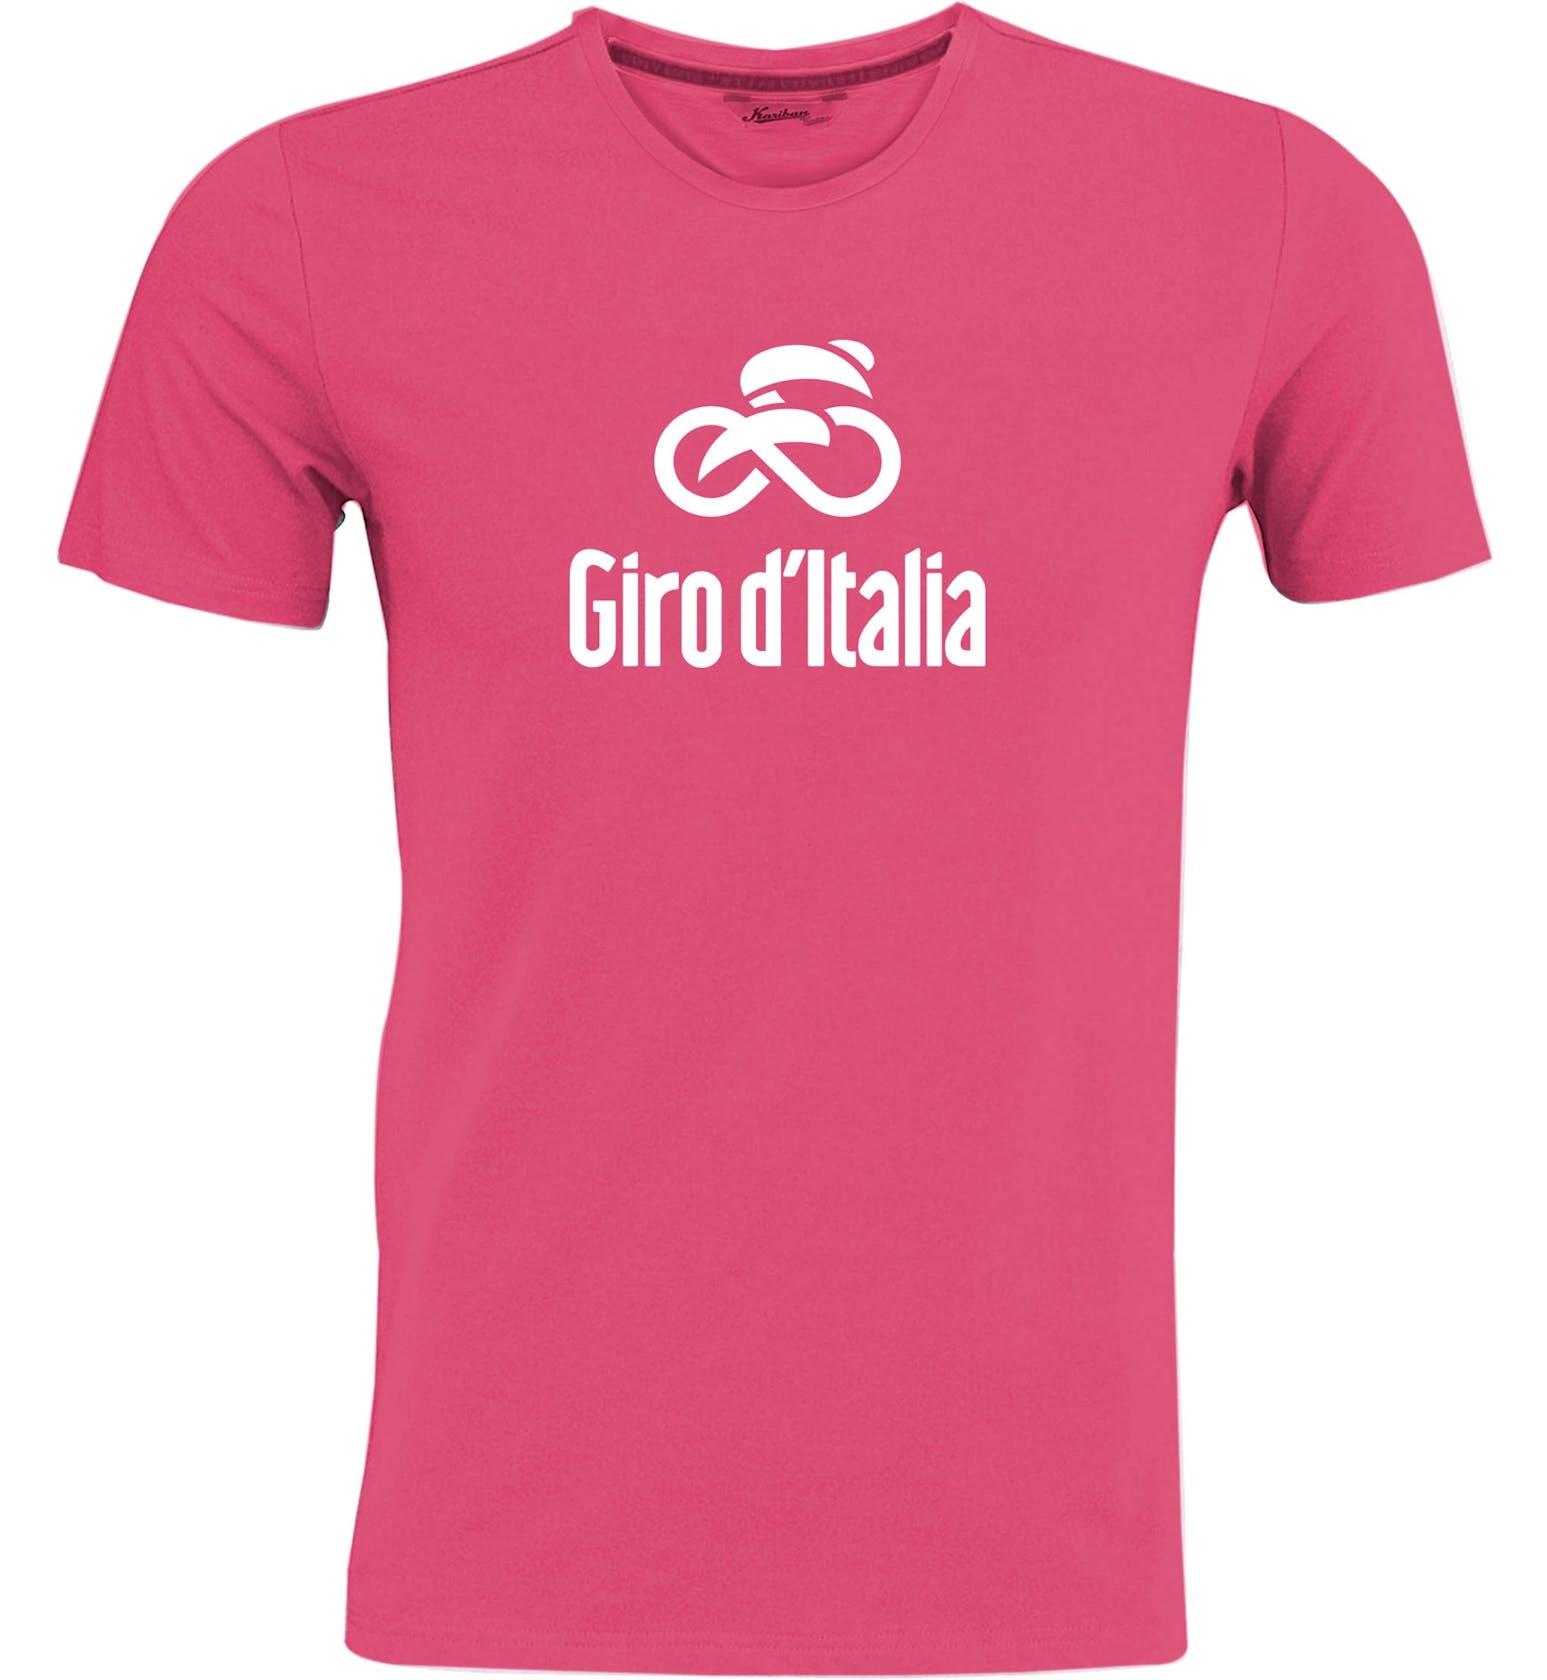 Giro d'Italia Giro d'Italia - T-Shirt - Unisex